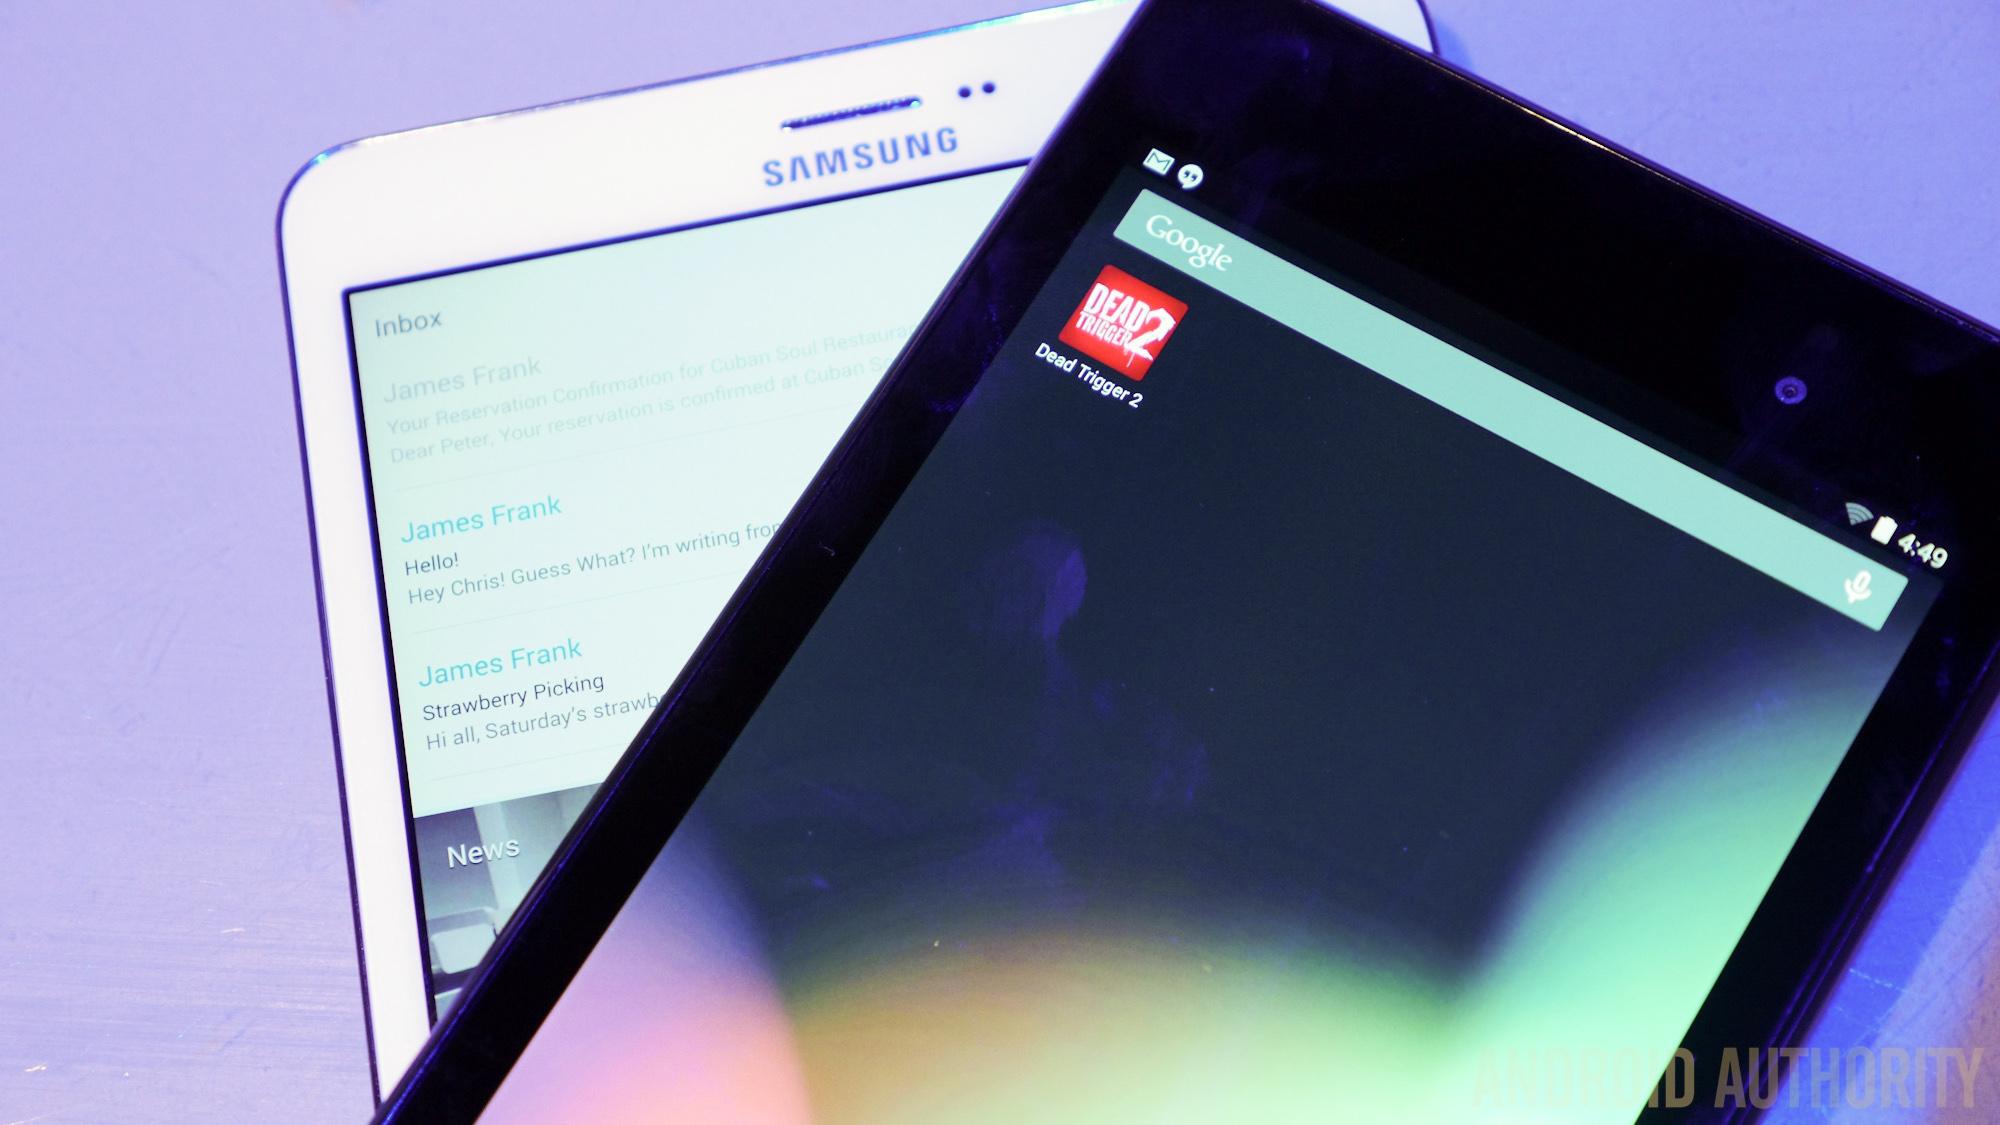 Samsung Galaxy TabPro 12.2 vs Nexus 7 2013 -2